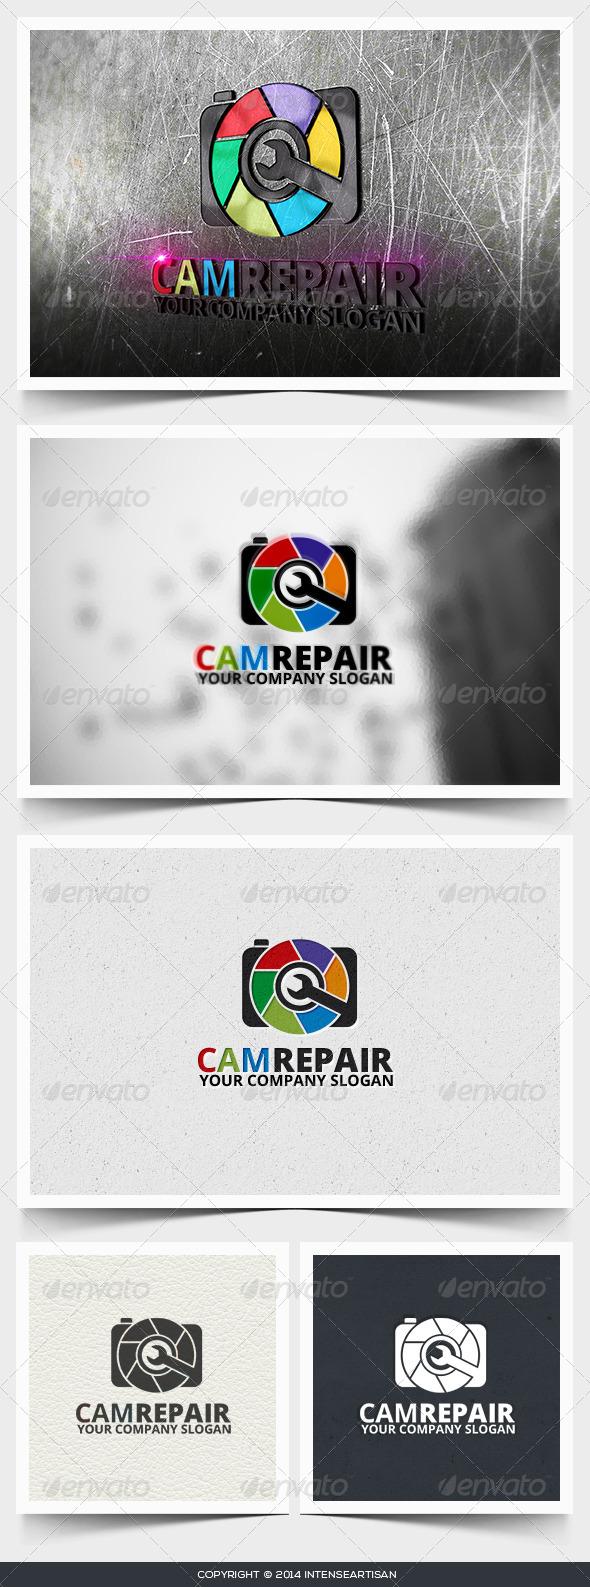 GraphicRiver Camrepair Logo Template 6643129